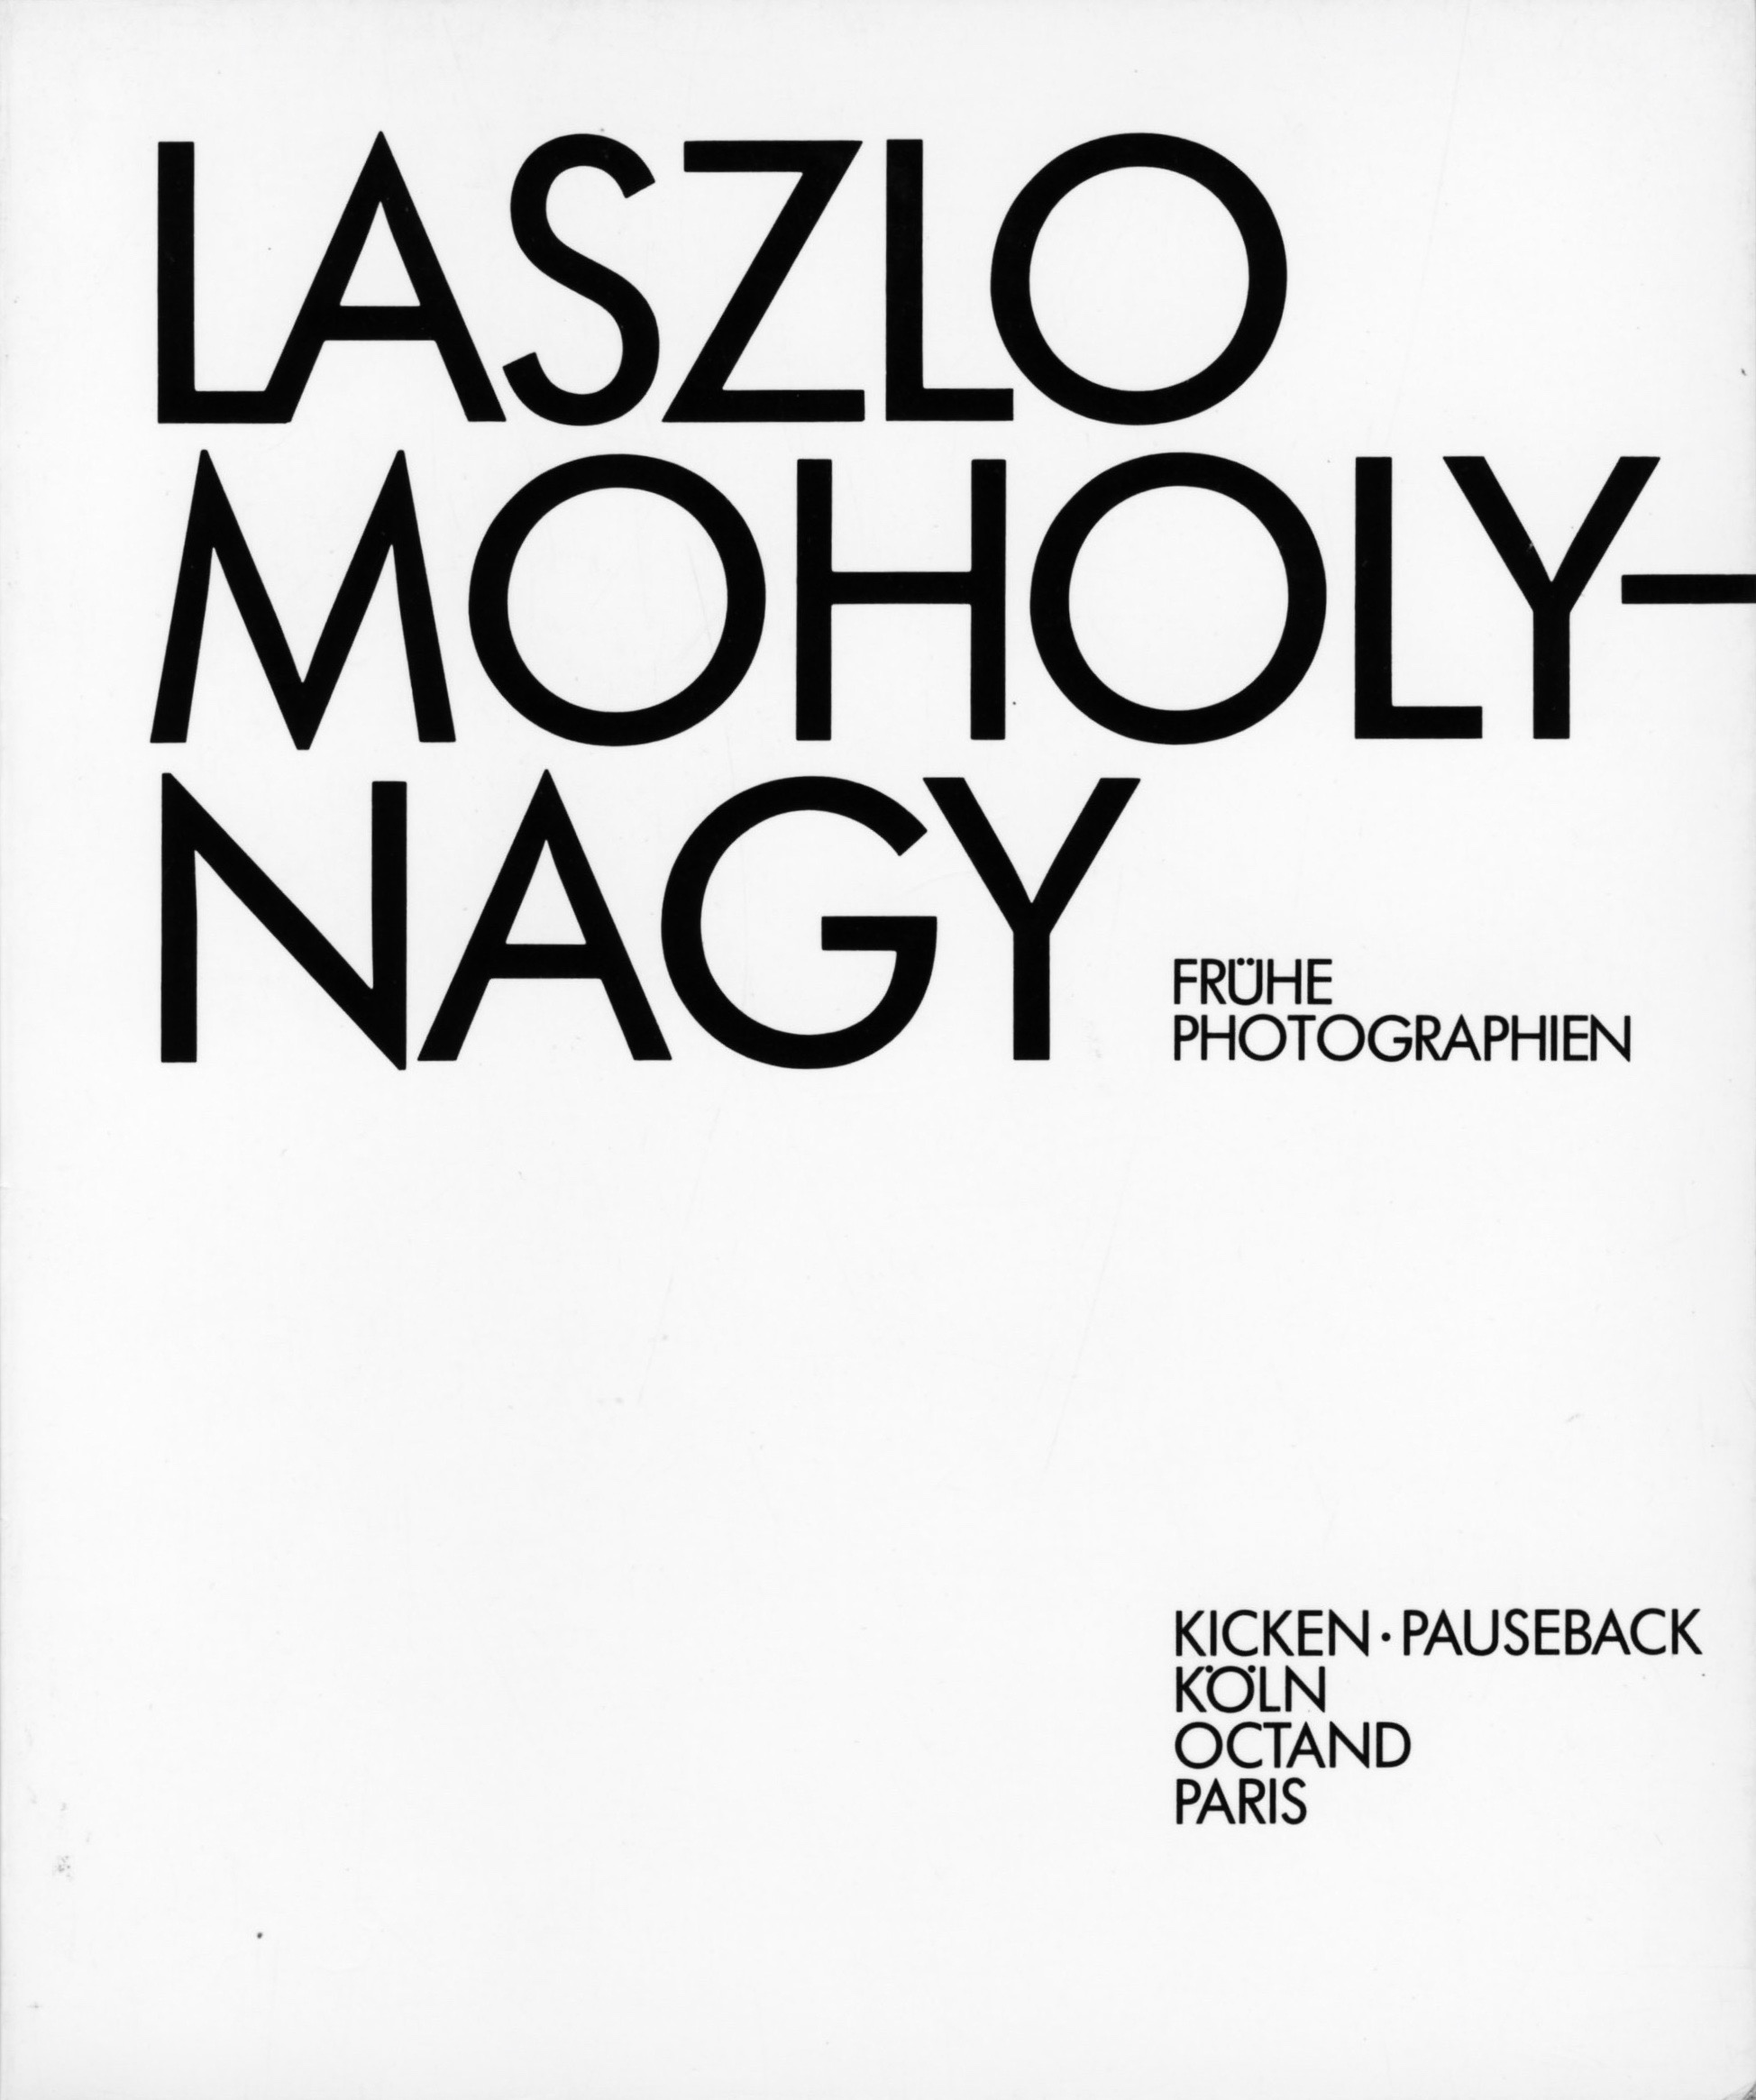 laszlo-moholy-nagy_francoise-paviot